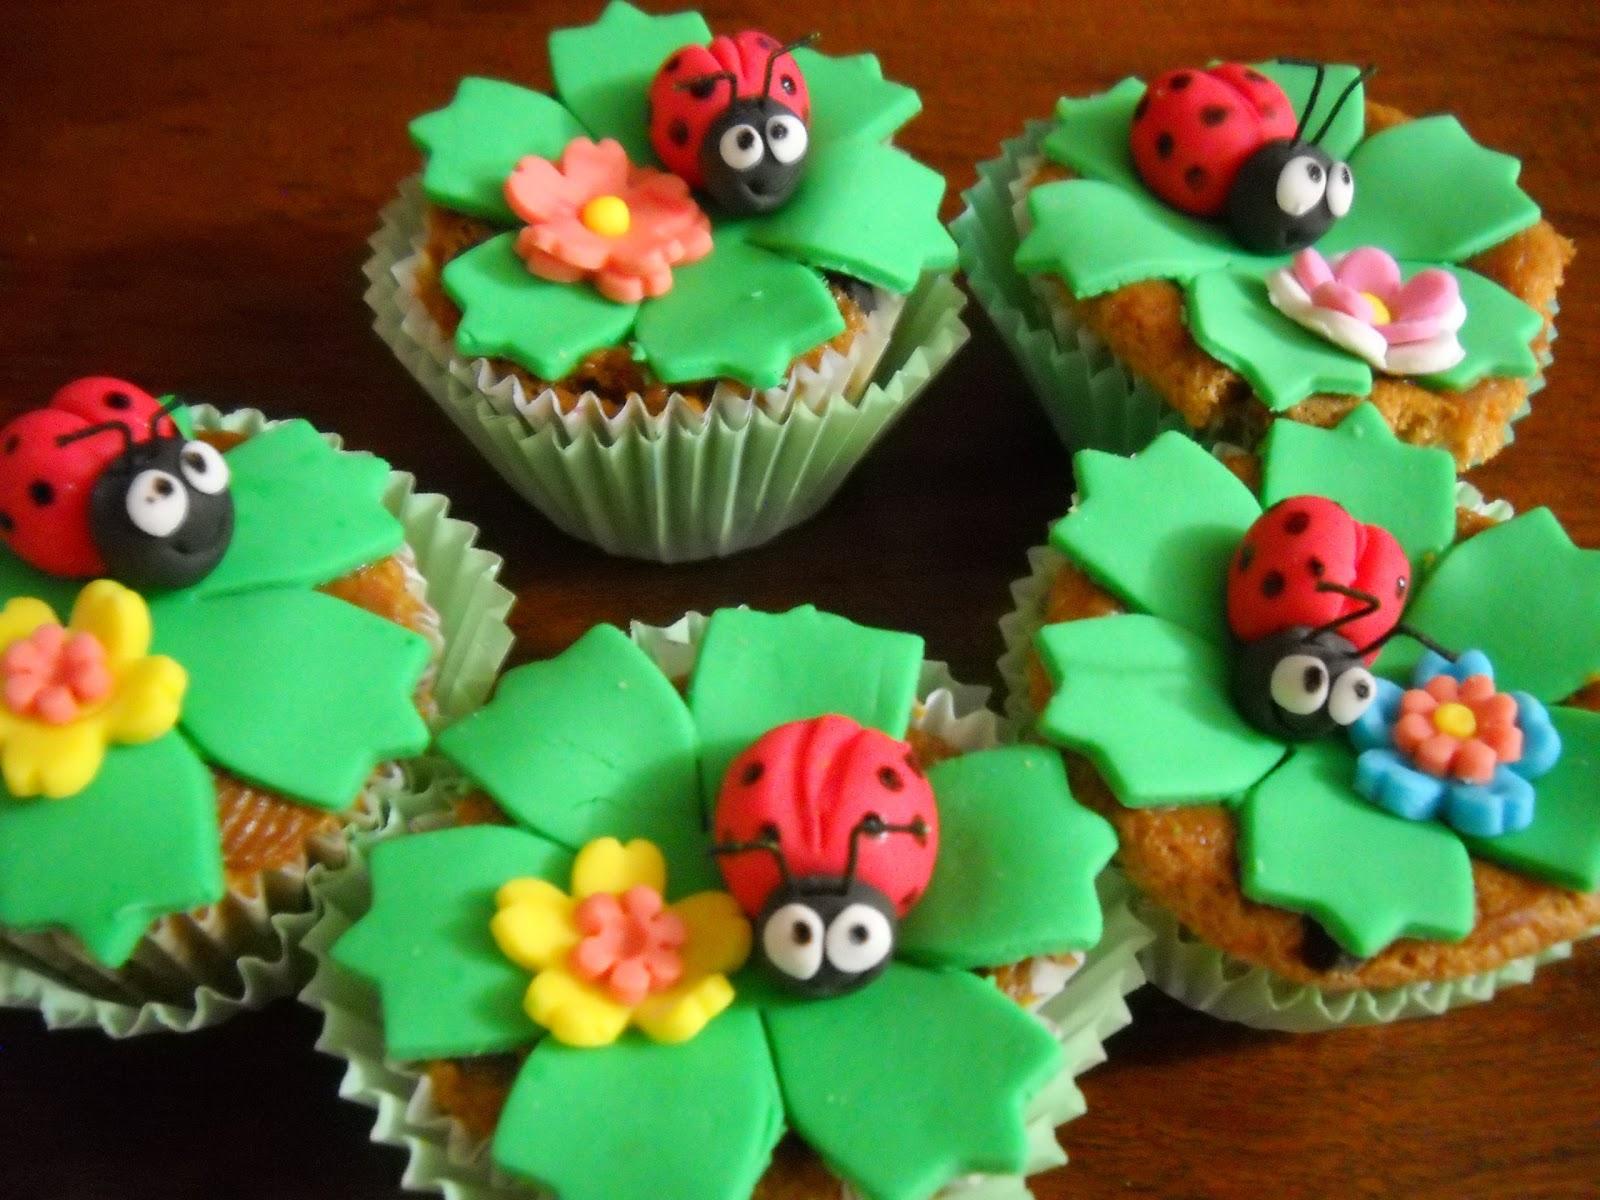 Mis Tortitas Decoradas: Torta de cumpleaños Vaquita de San Antonio